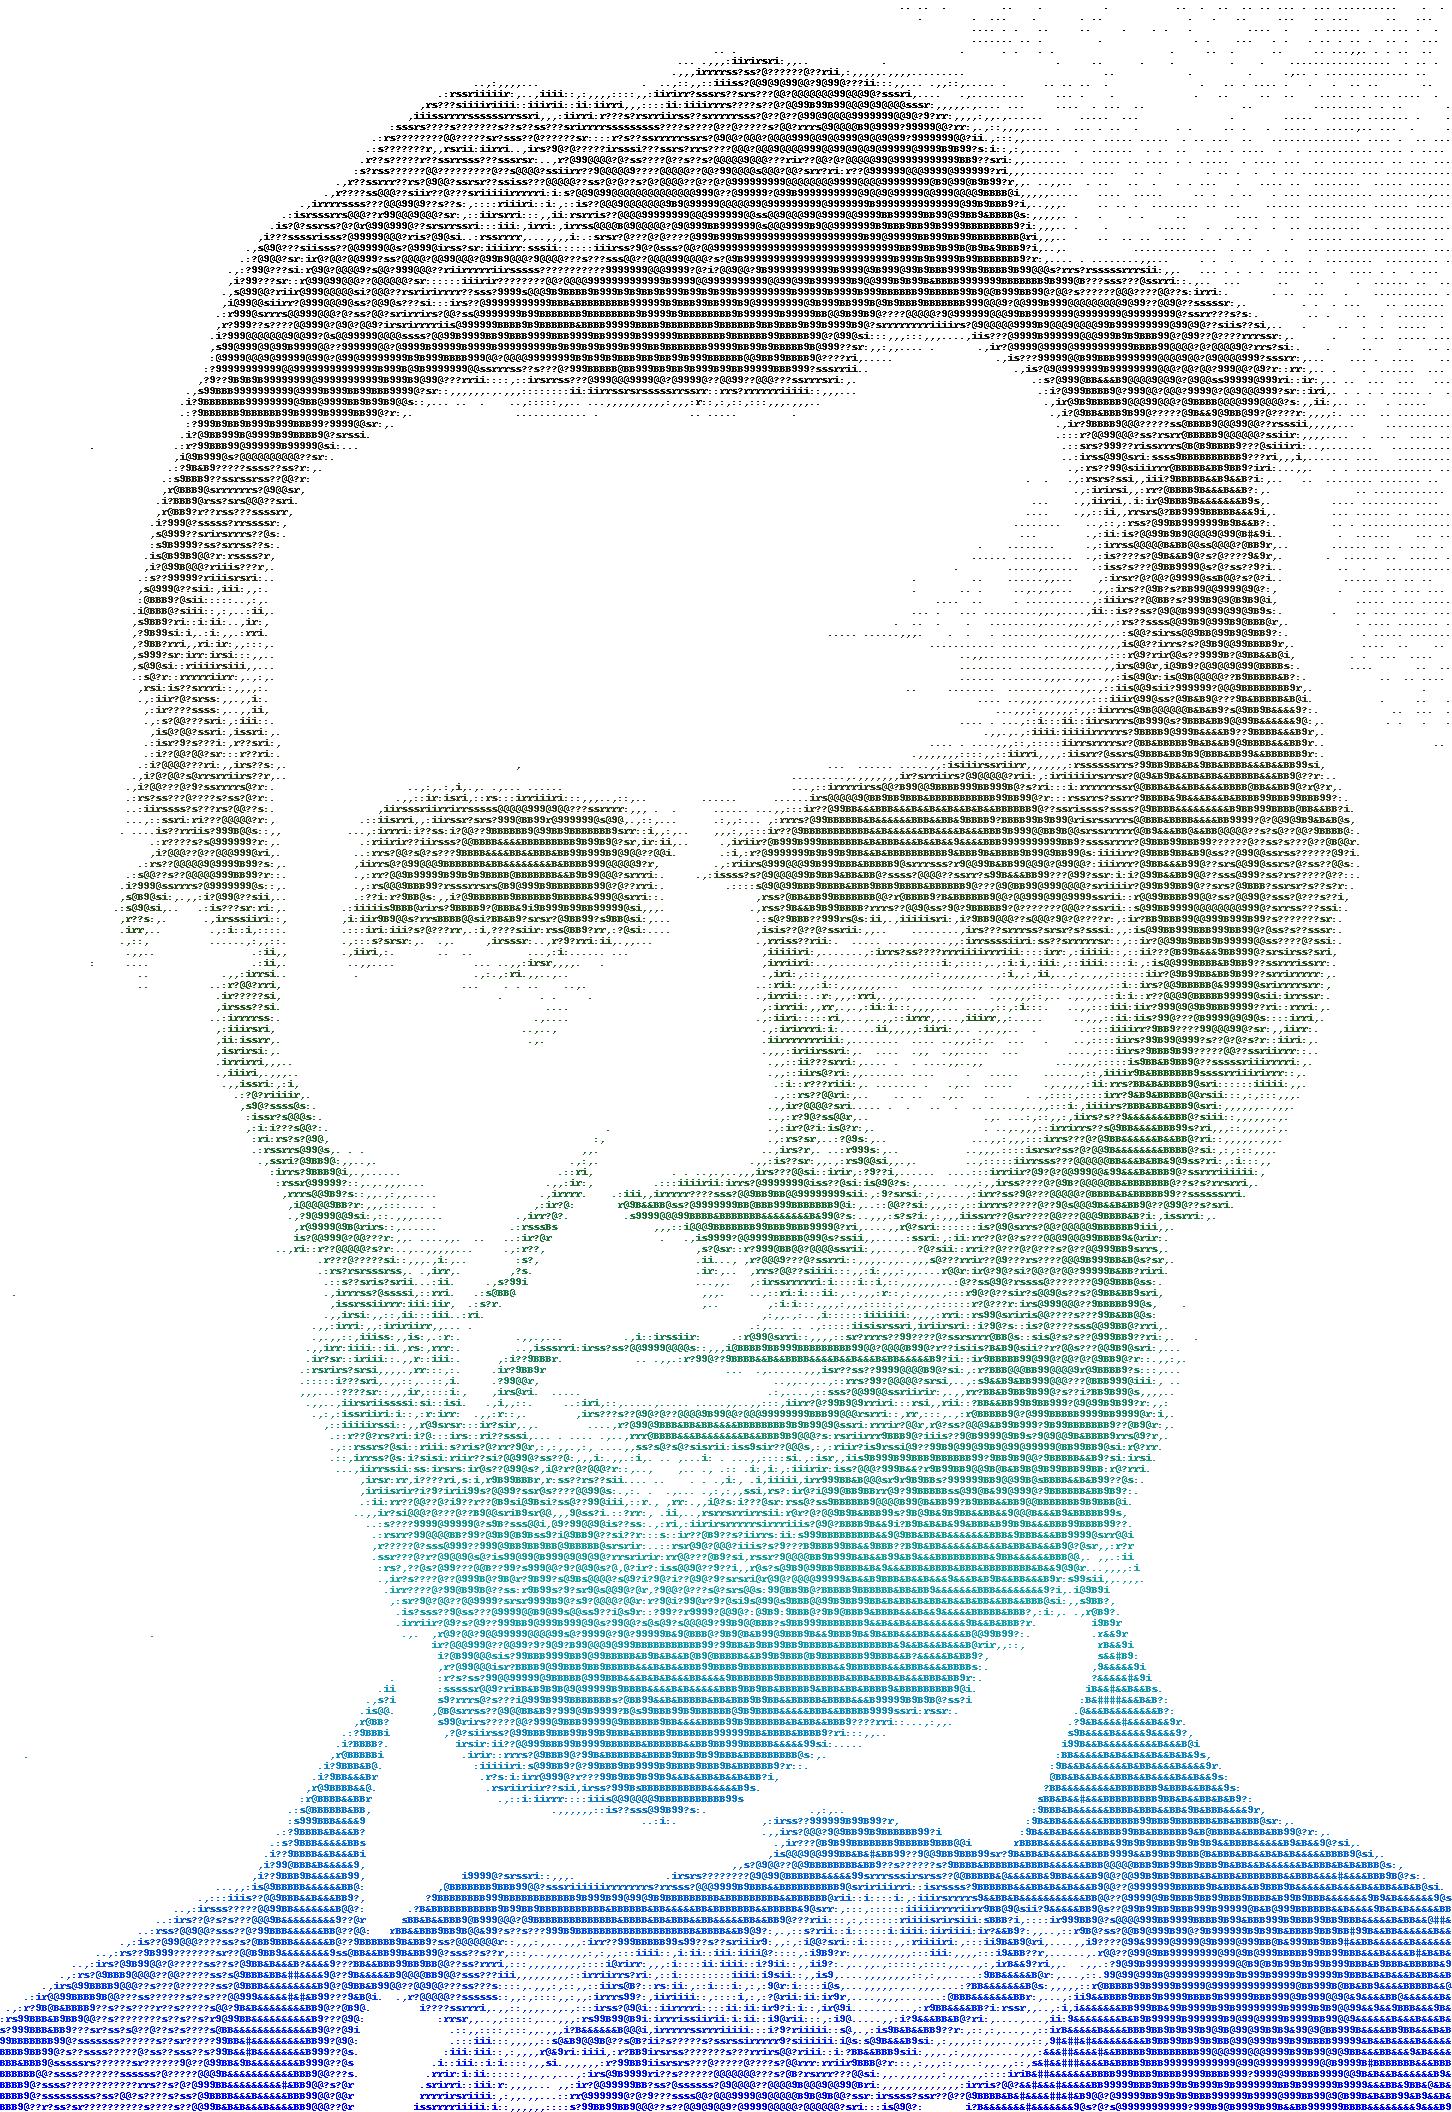 Convert Photos to ASCII Arts with Python - Tinkering